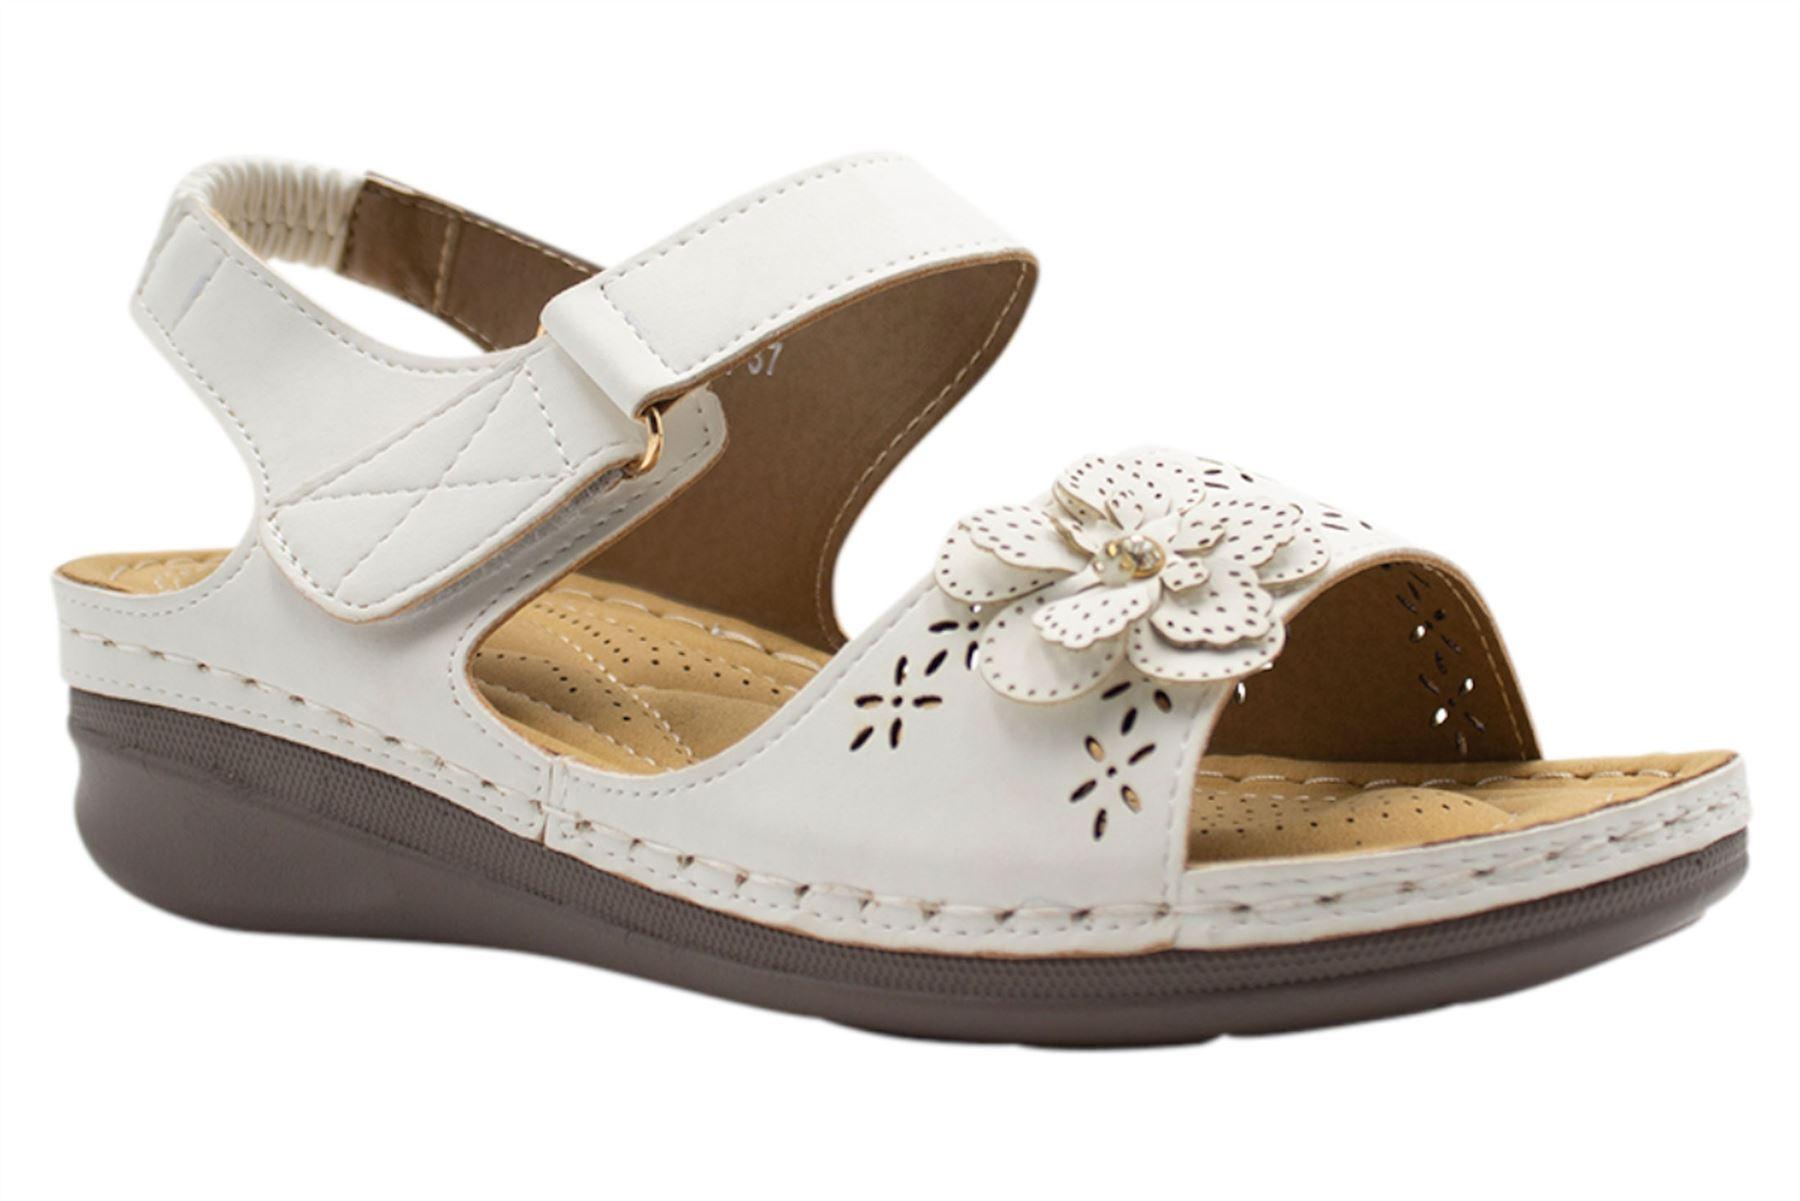 Ladies-Sandals-Womens-Mid-Heel-Comfort-Summer-Beach-Casual-Wear miniatura 46